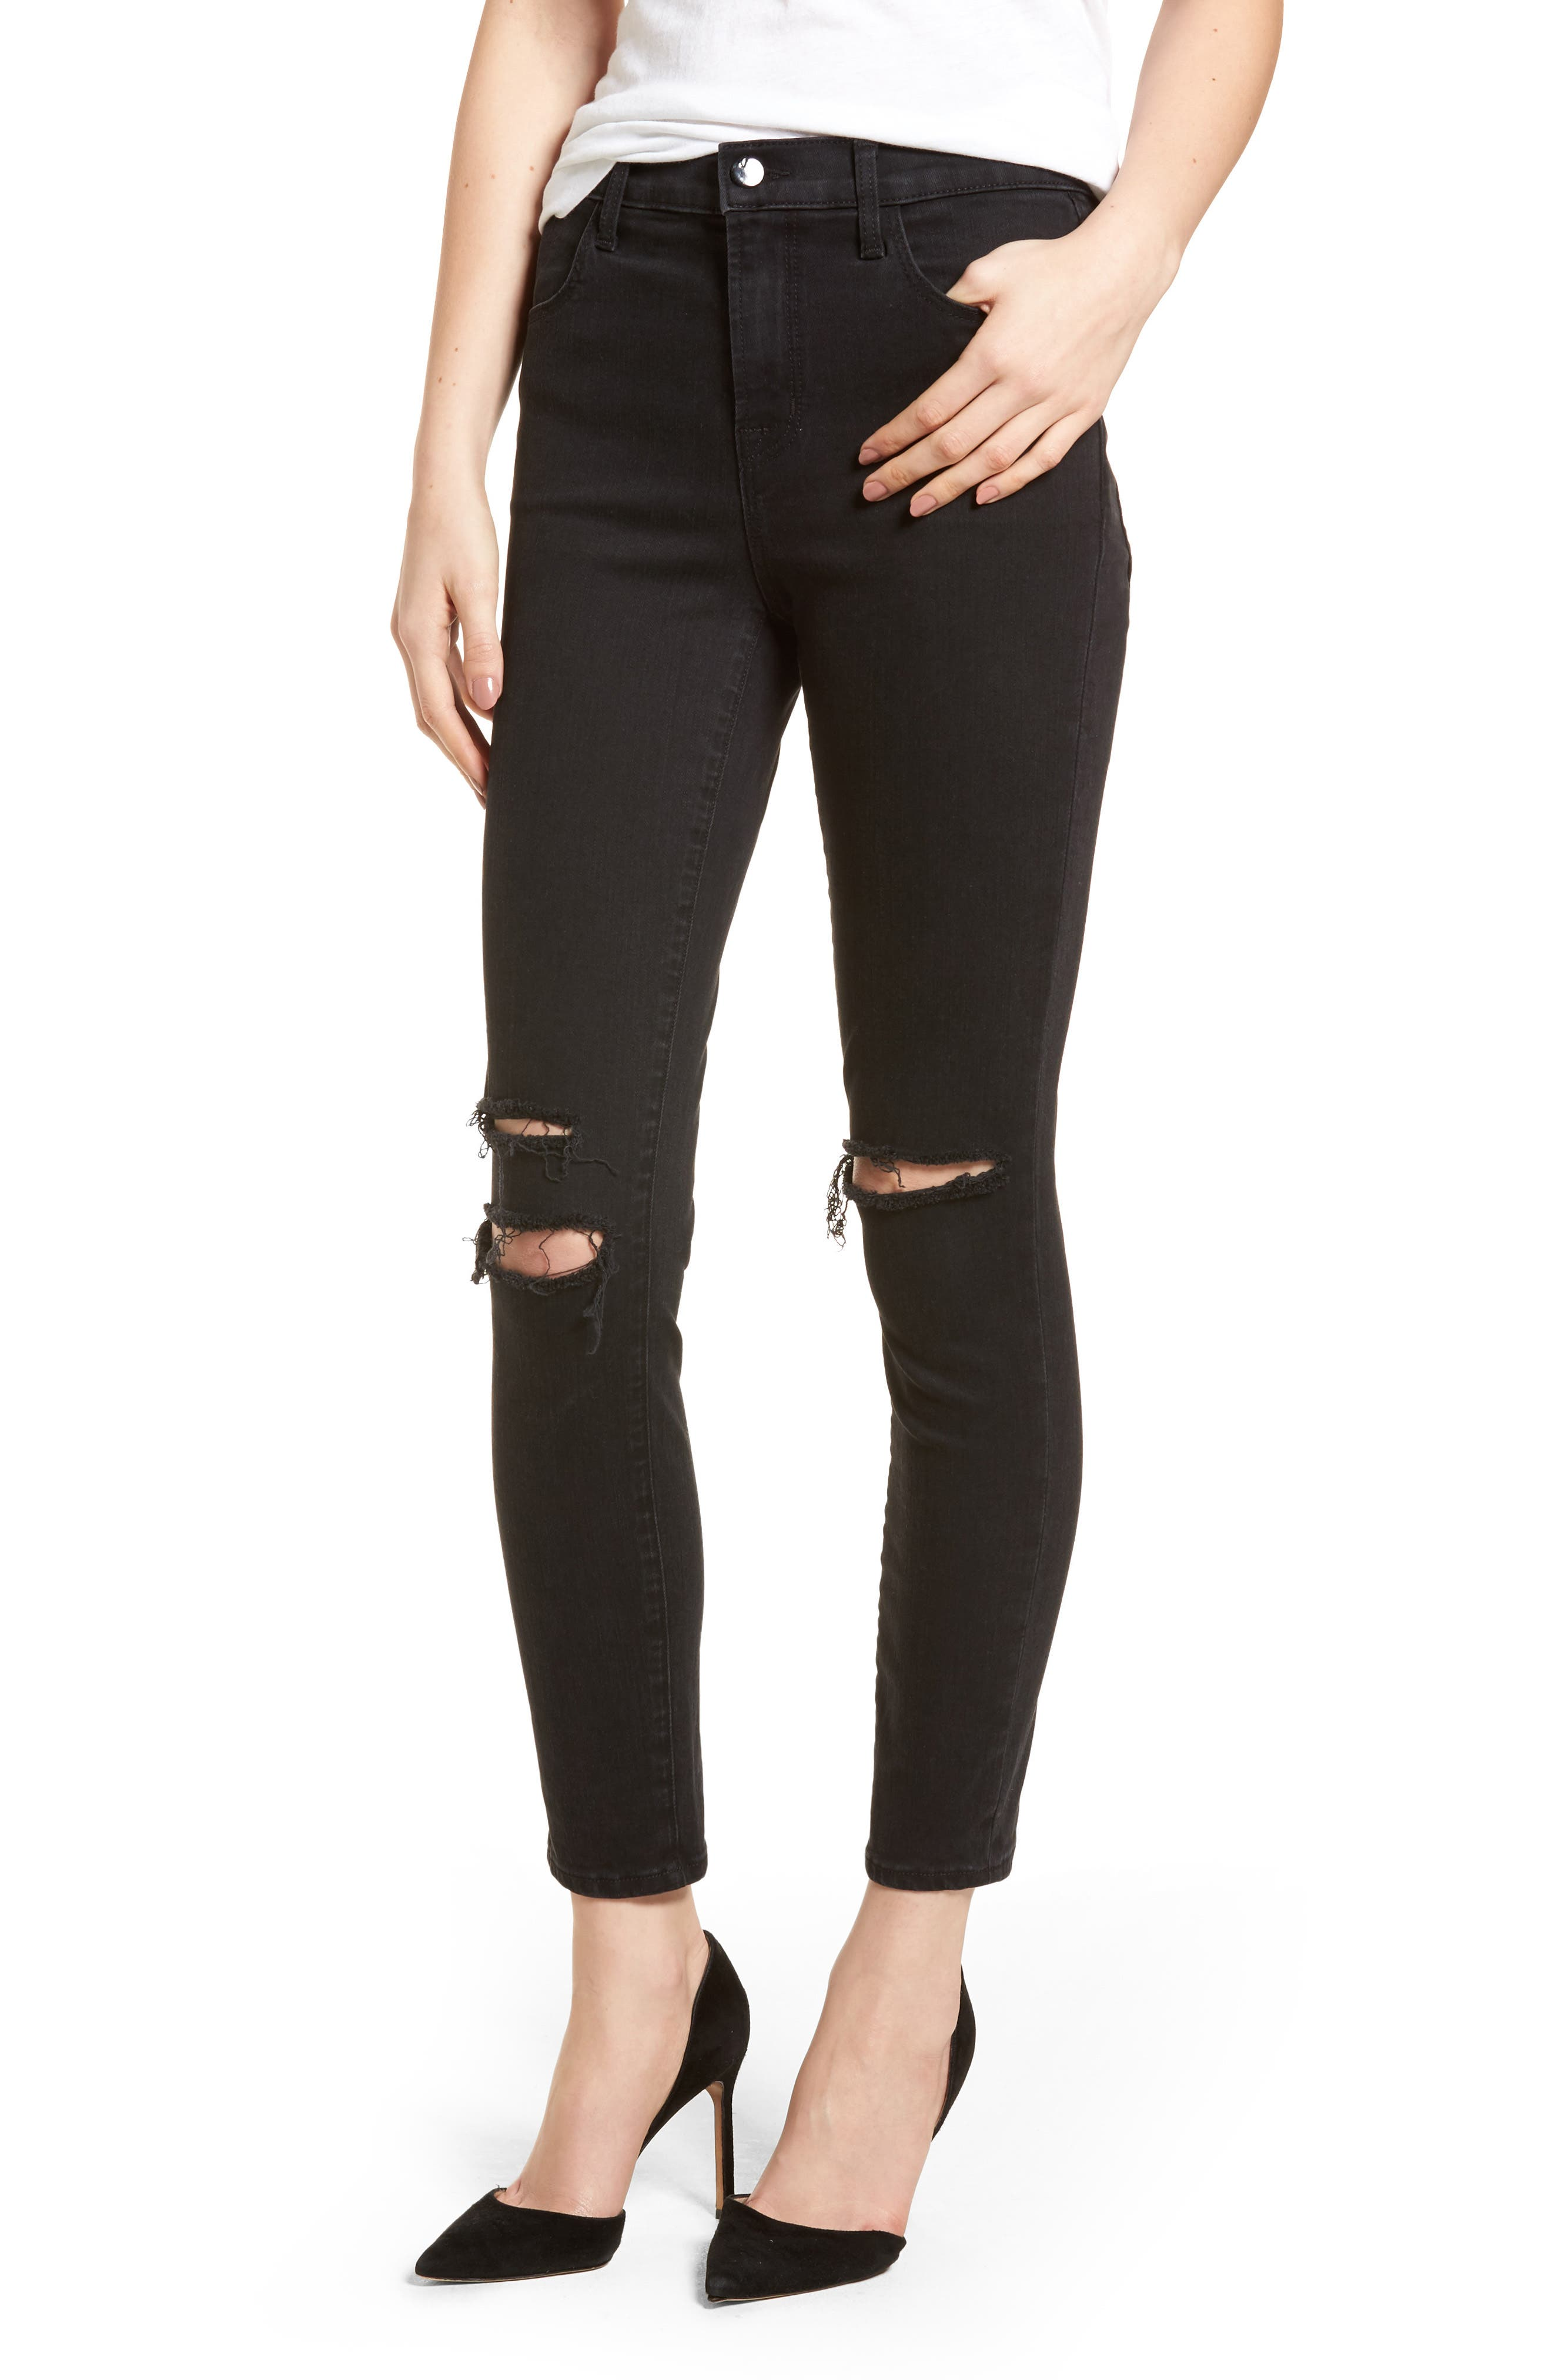 J Brand Alana High Waist Ankle Skinny Jeans (Black Mercy) (Nordstrom Exclusive)